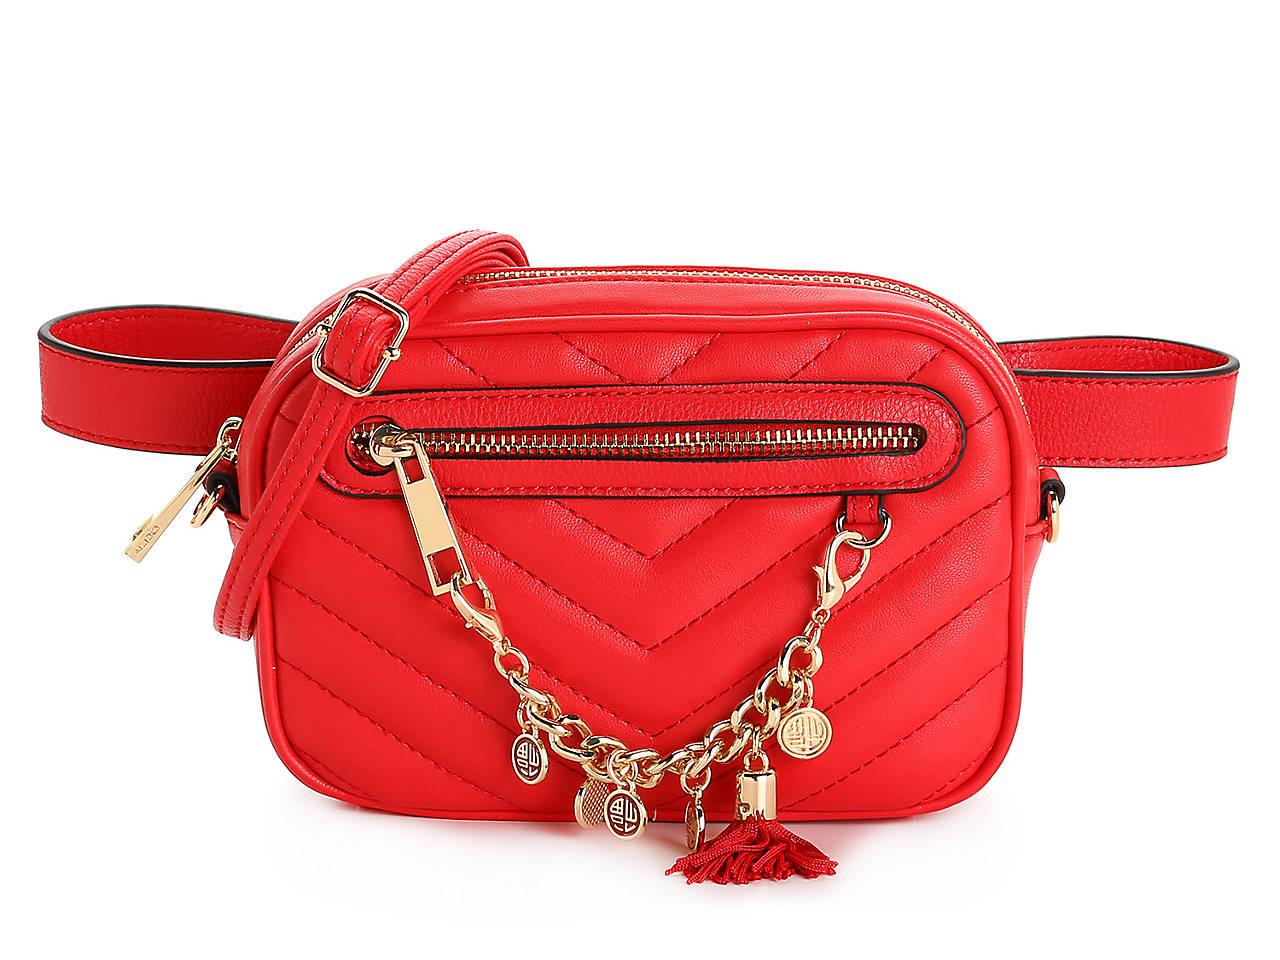 41fd66340dd Aldo Taunton Charm Belt Bag Women s Handbags   Accessories